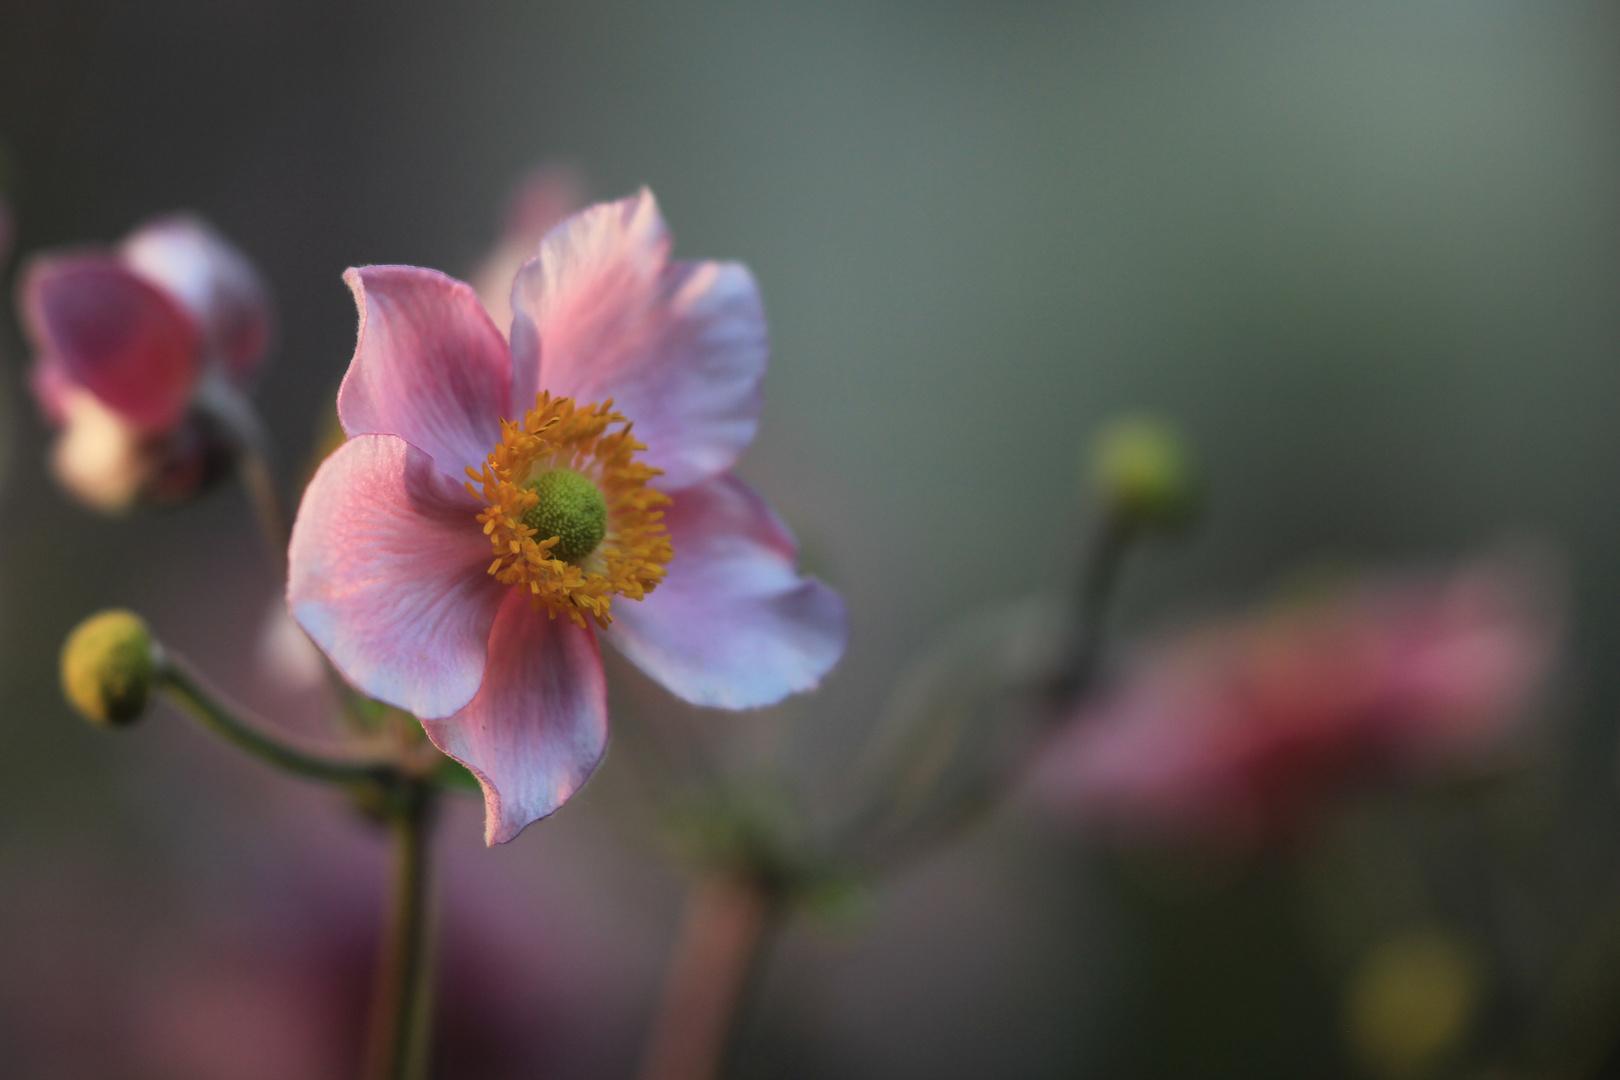 Rosa Herbst